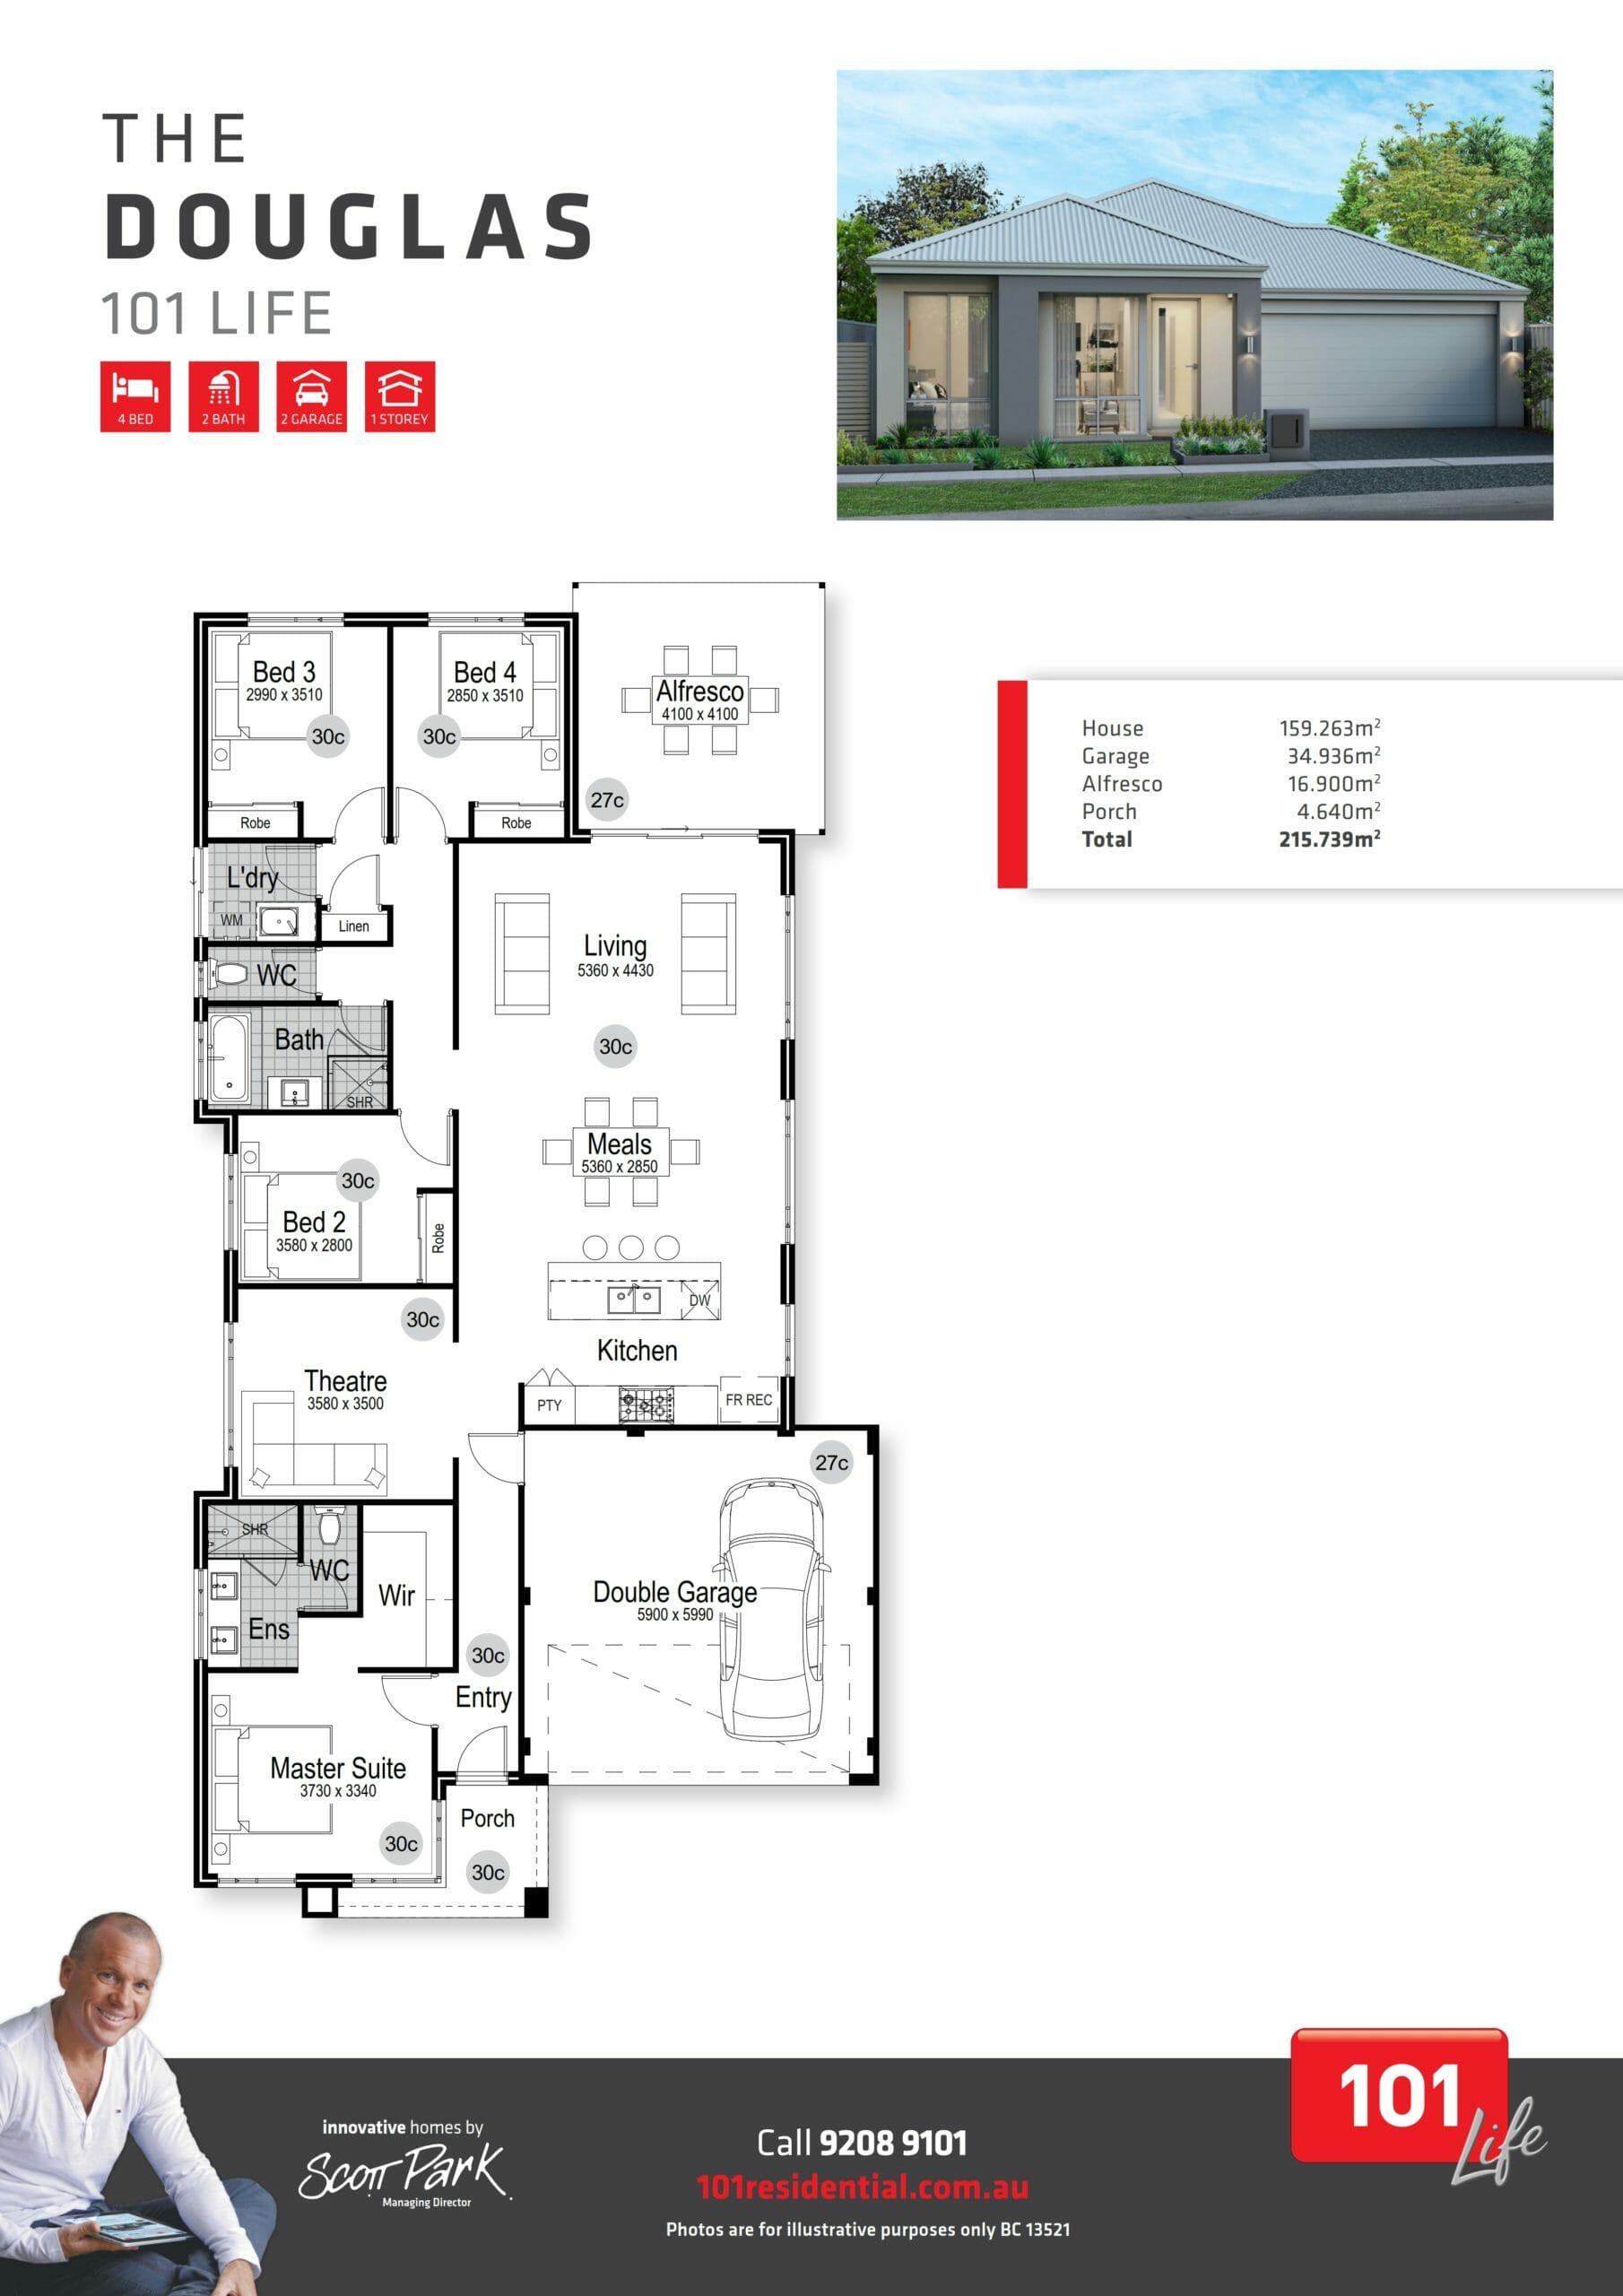 101 A3 Floor Plan - Douglas WEB_001